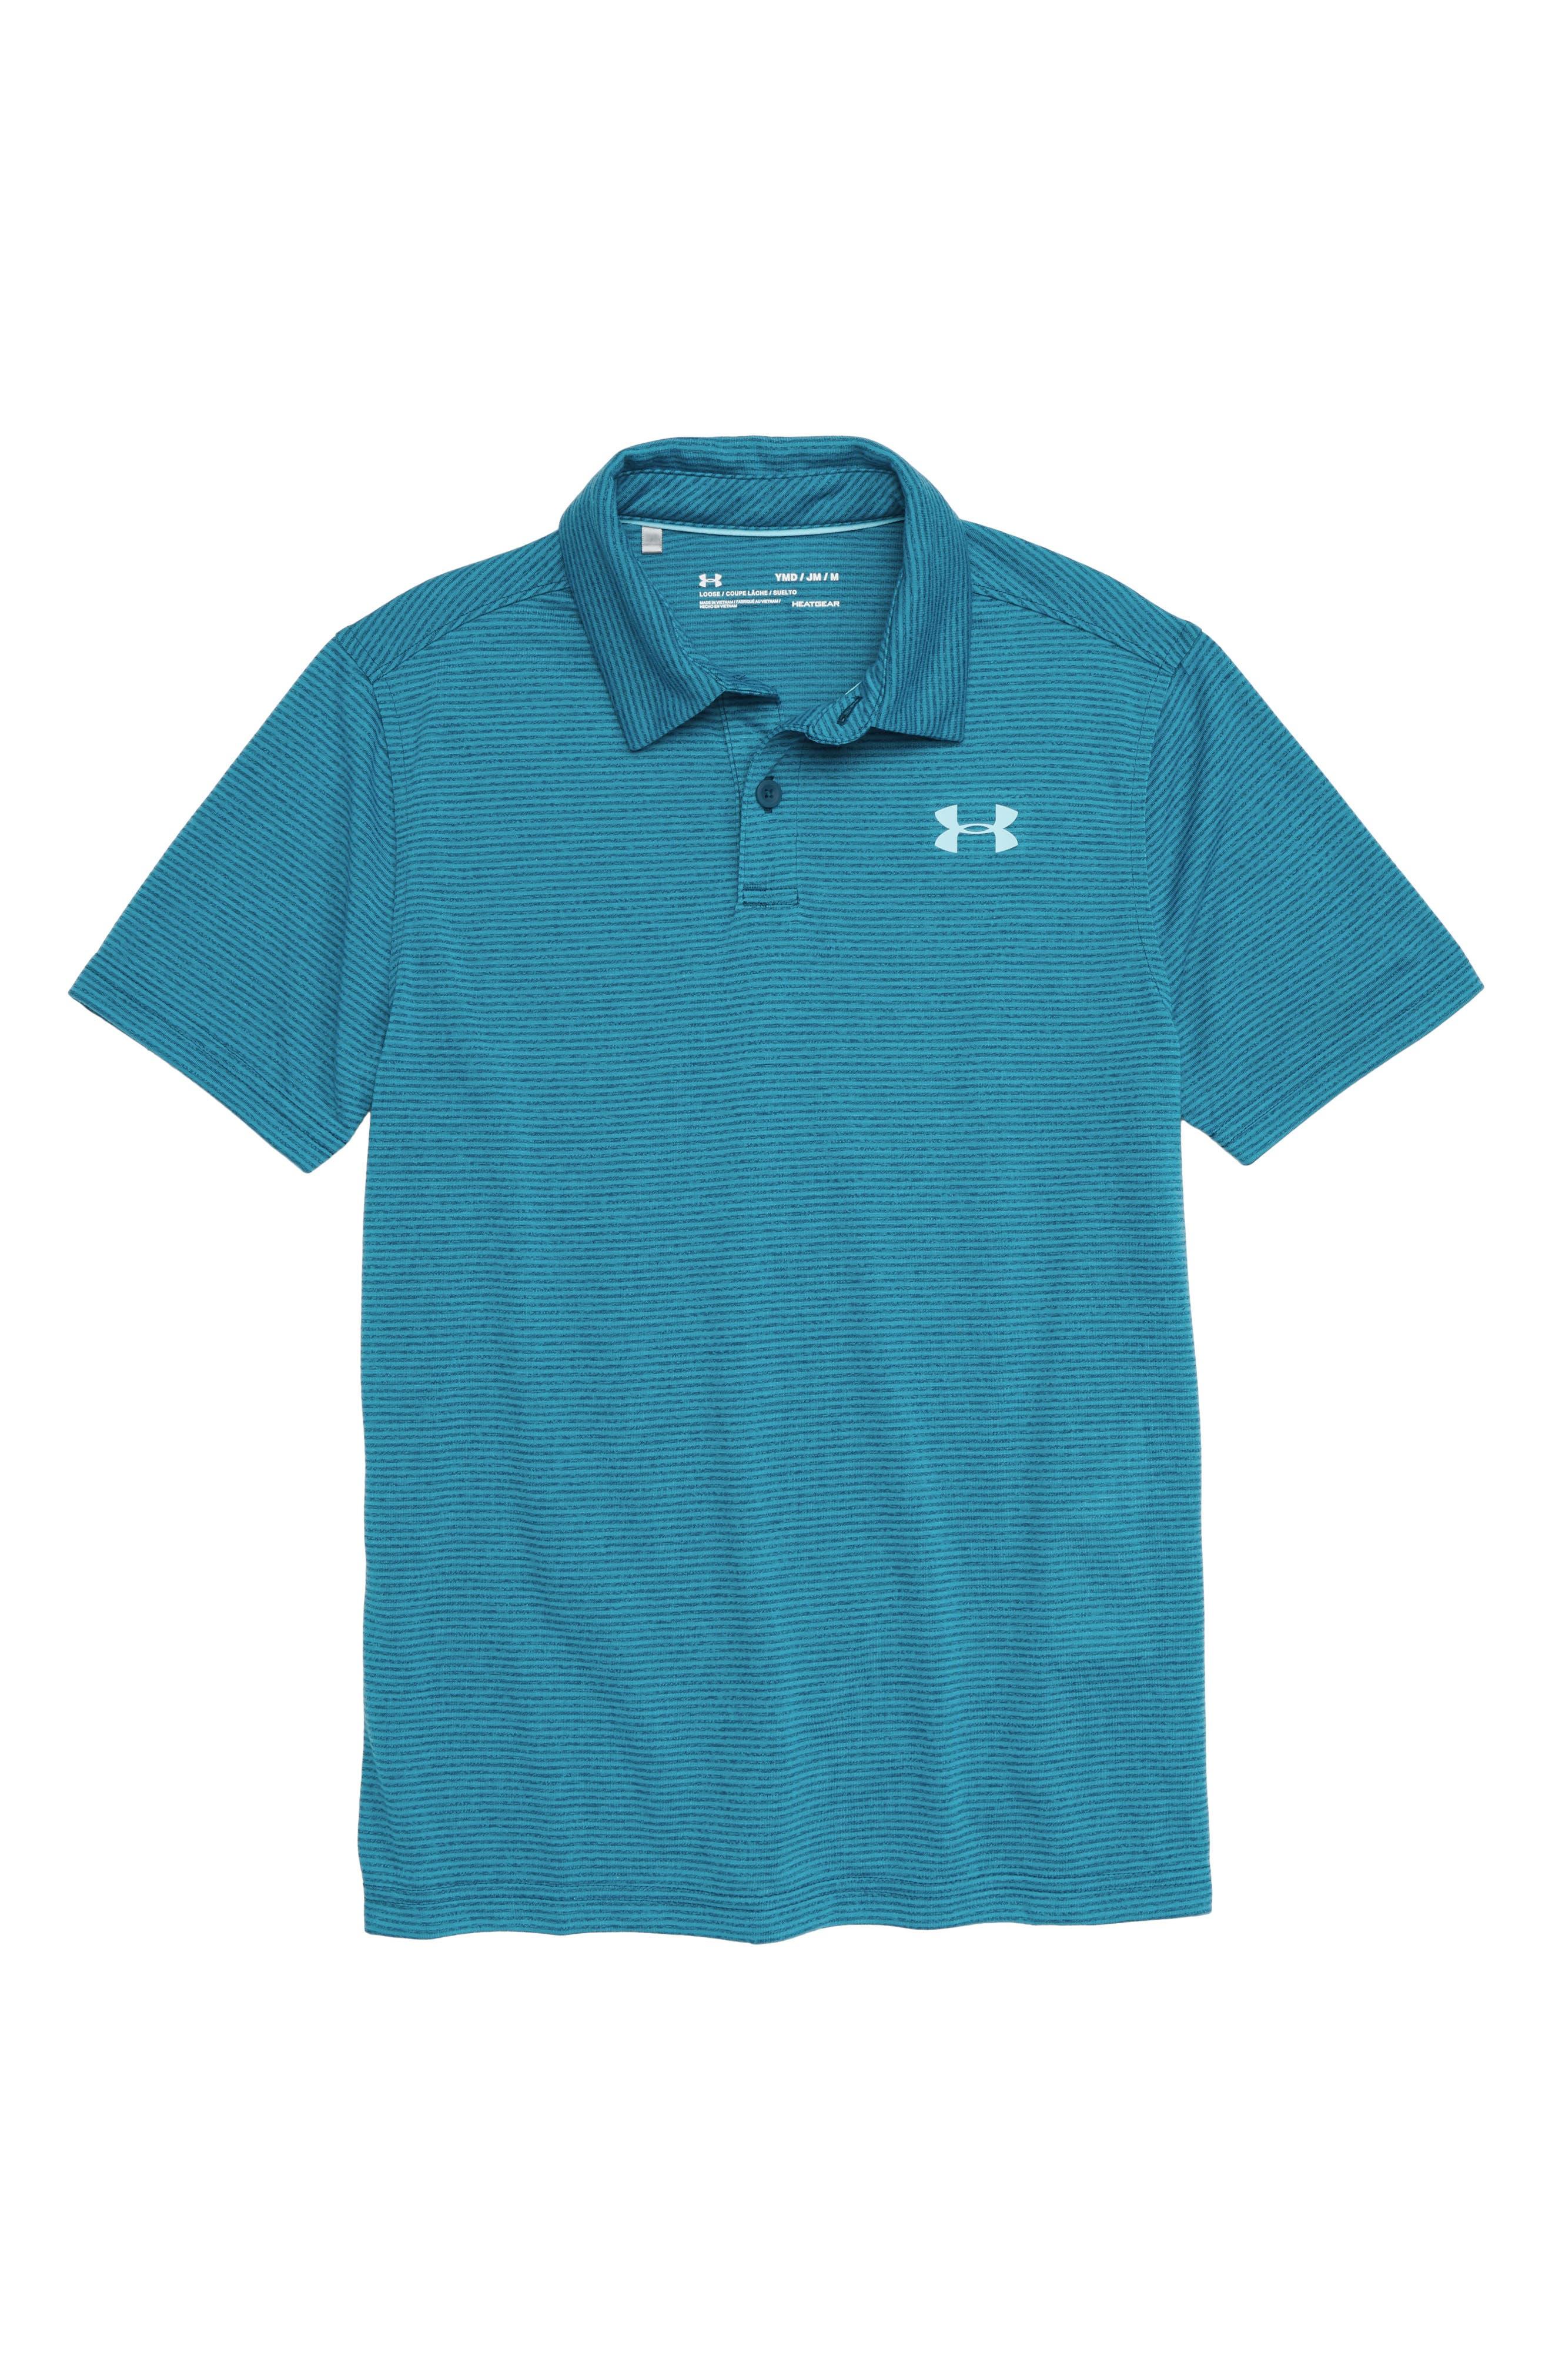 Threadborne Polo,                         Main,                         color, 490